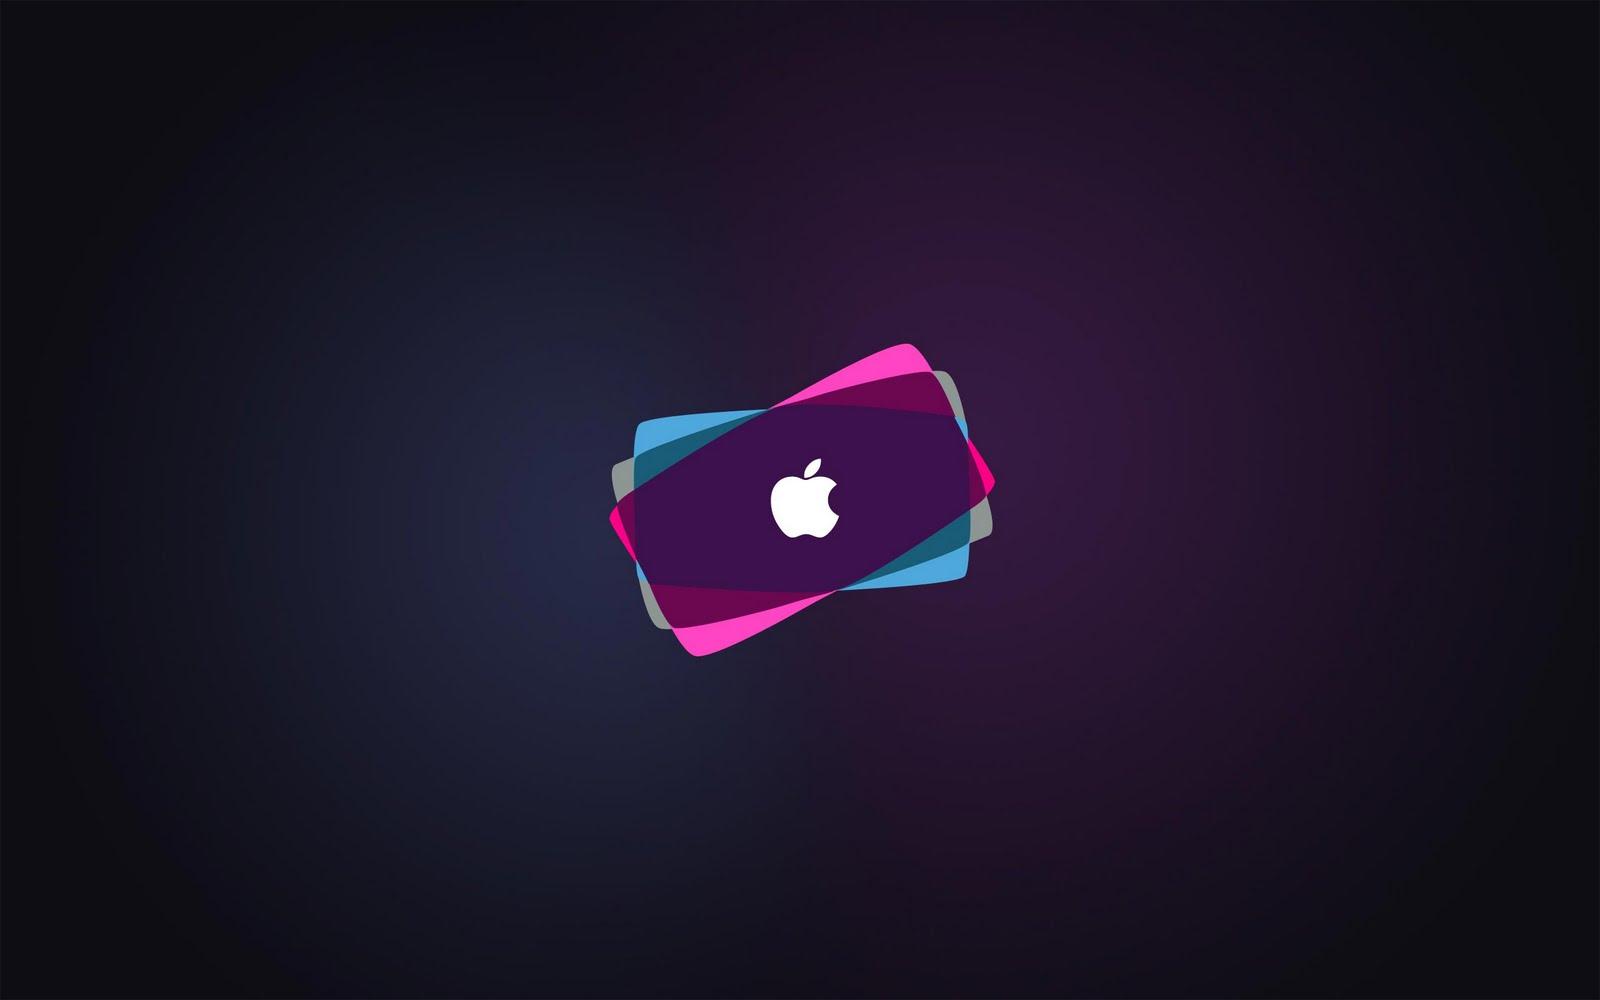 http://1.bp.blogspot.com/-i4SmBBv8MdM/TbcD_QpzGoI/AAAAAAAABhI/1CfTIu4hzt4/s1600/Apple_screen_protectors_hd_wallpaper.jpg